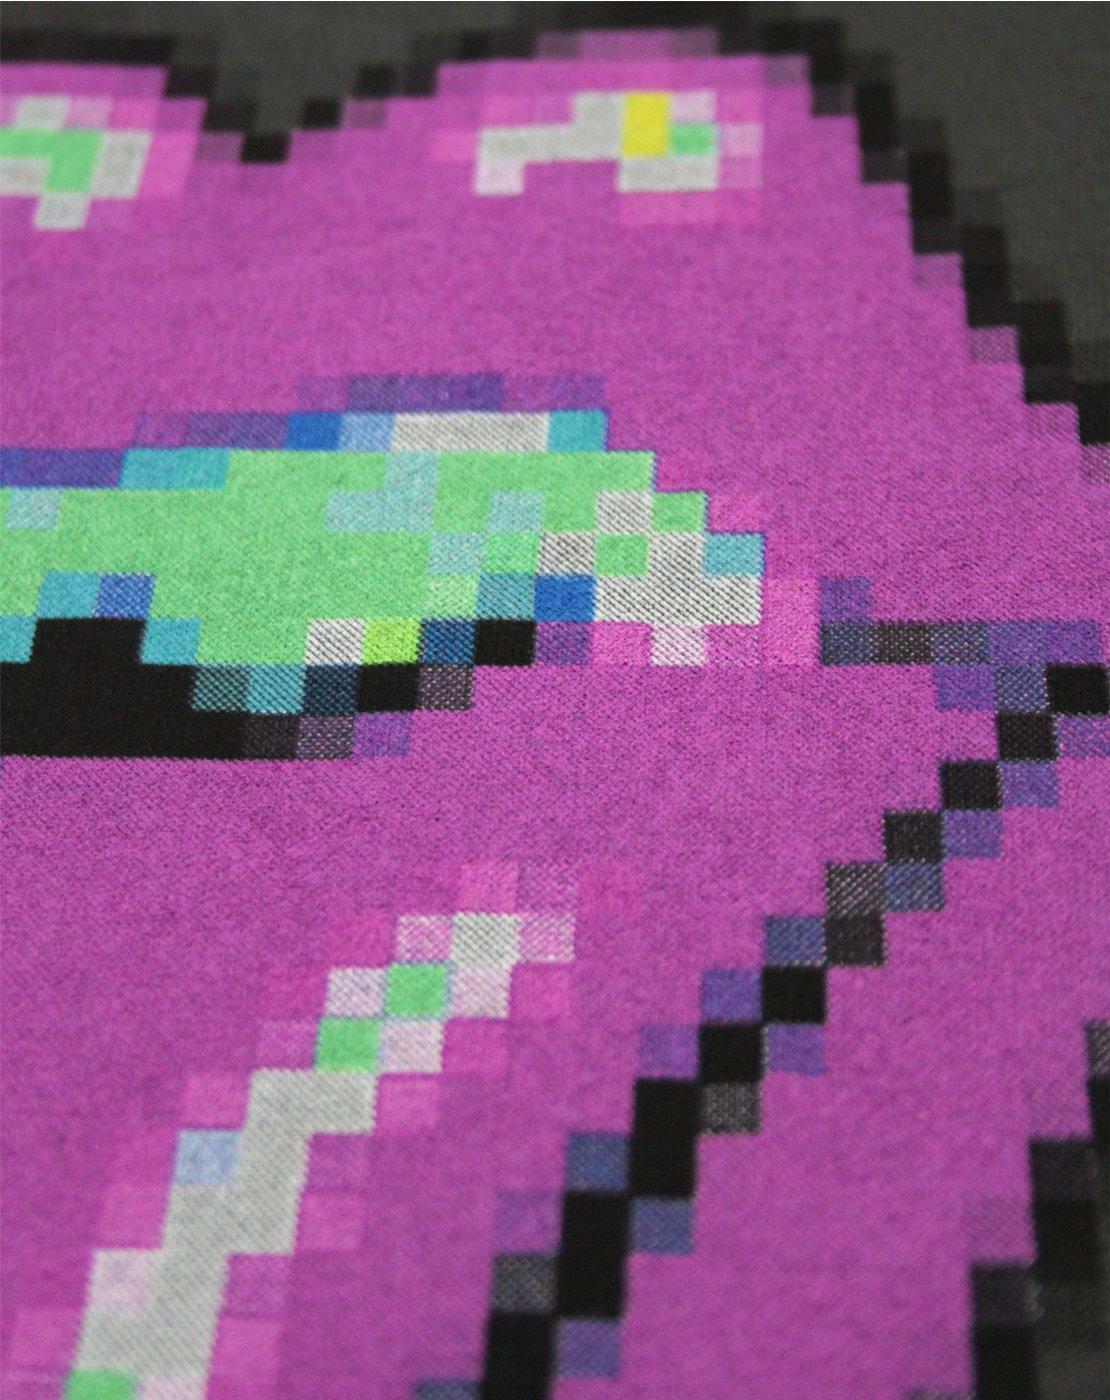 Amplified-Rolling-Stones-Pixel-Lick-Charcoal-Women-039-s-Vest thumbnail 7